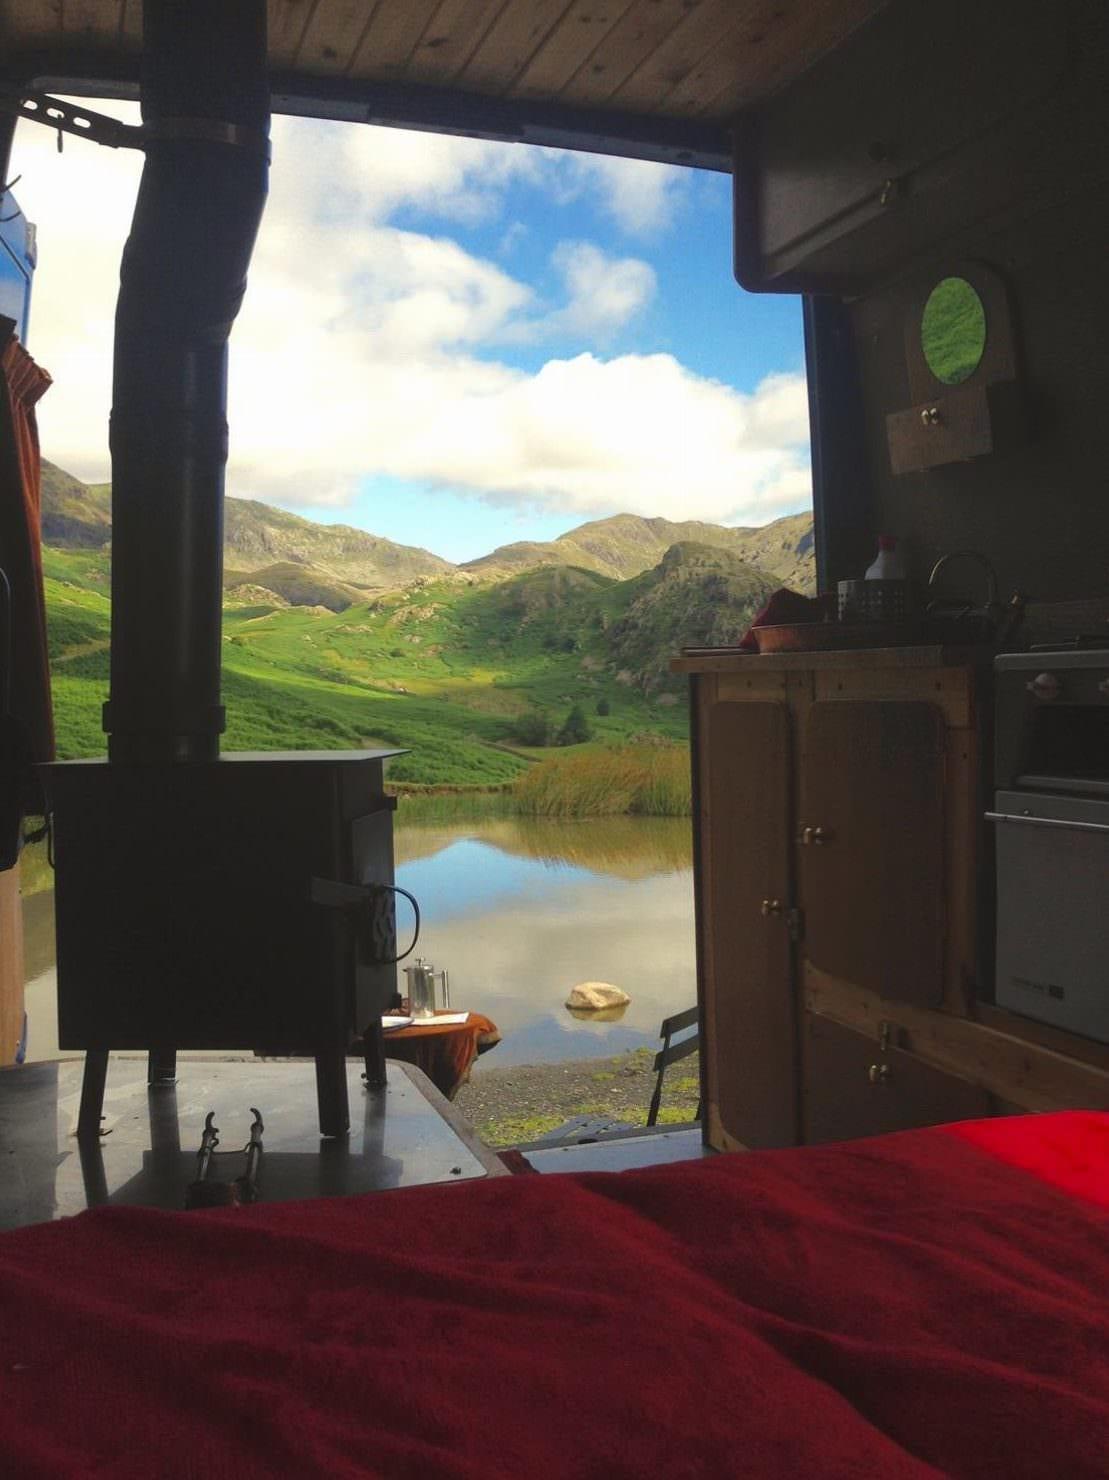 stunning views from elvira campervan on an adventure